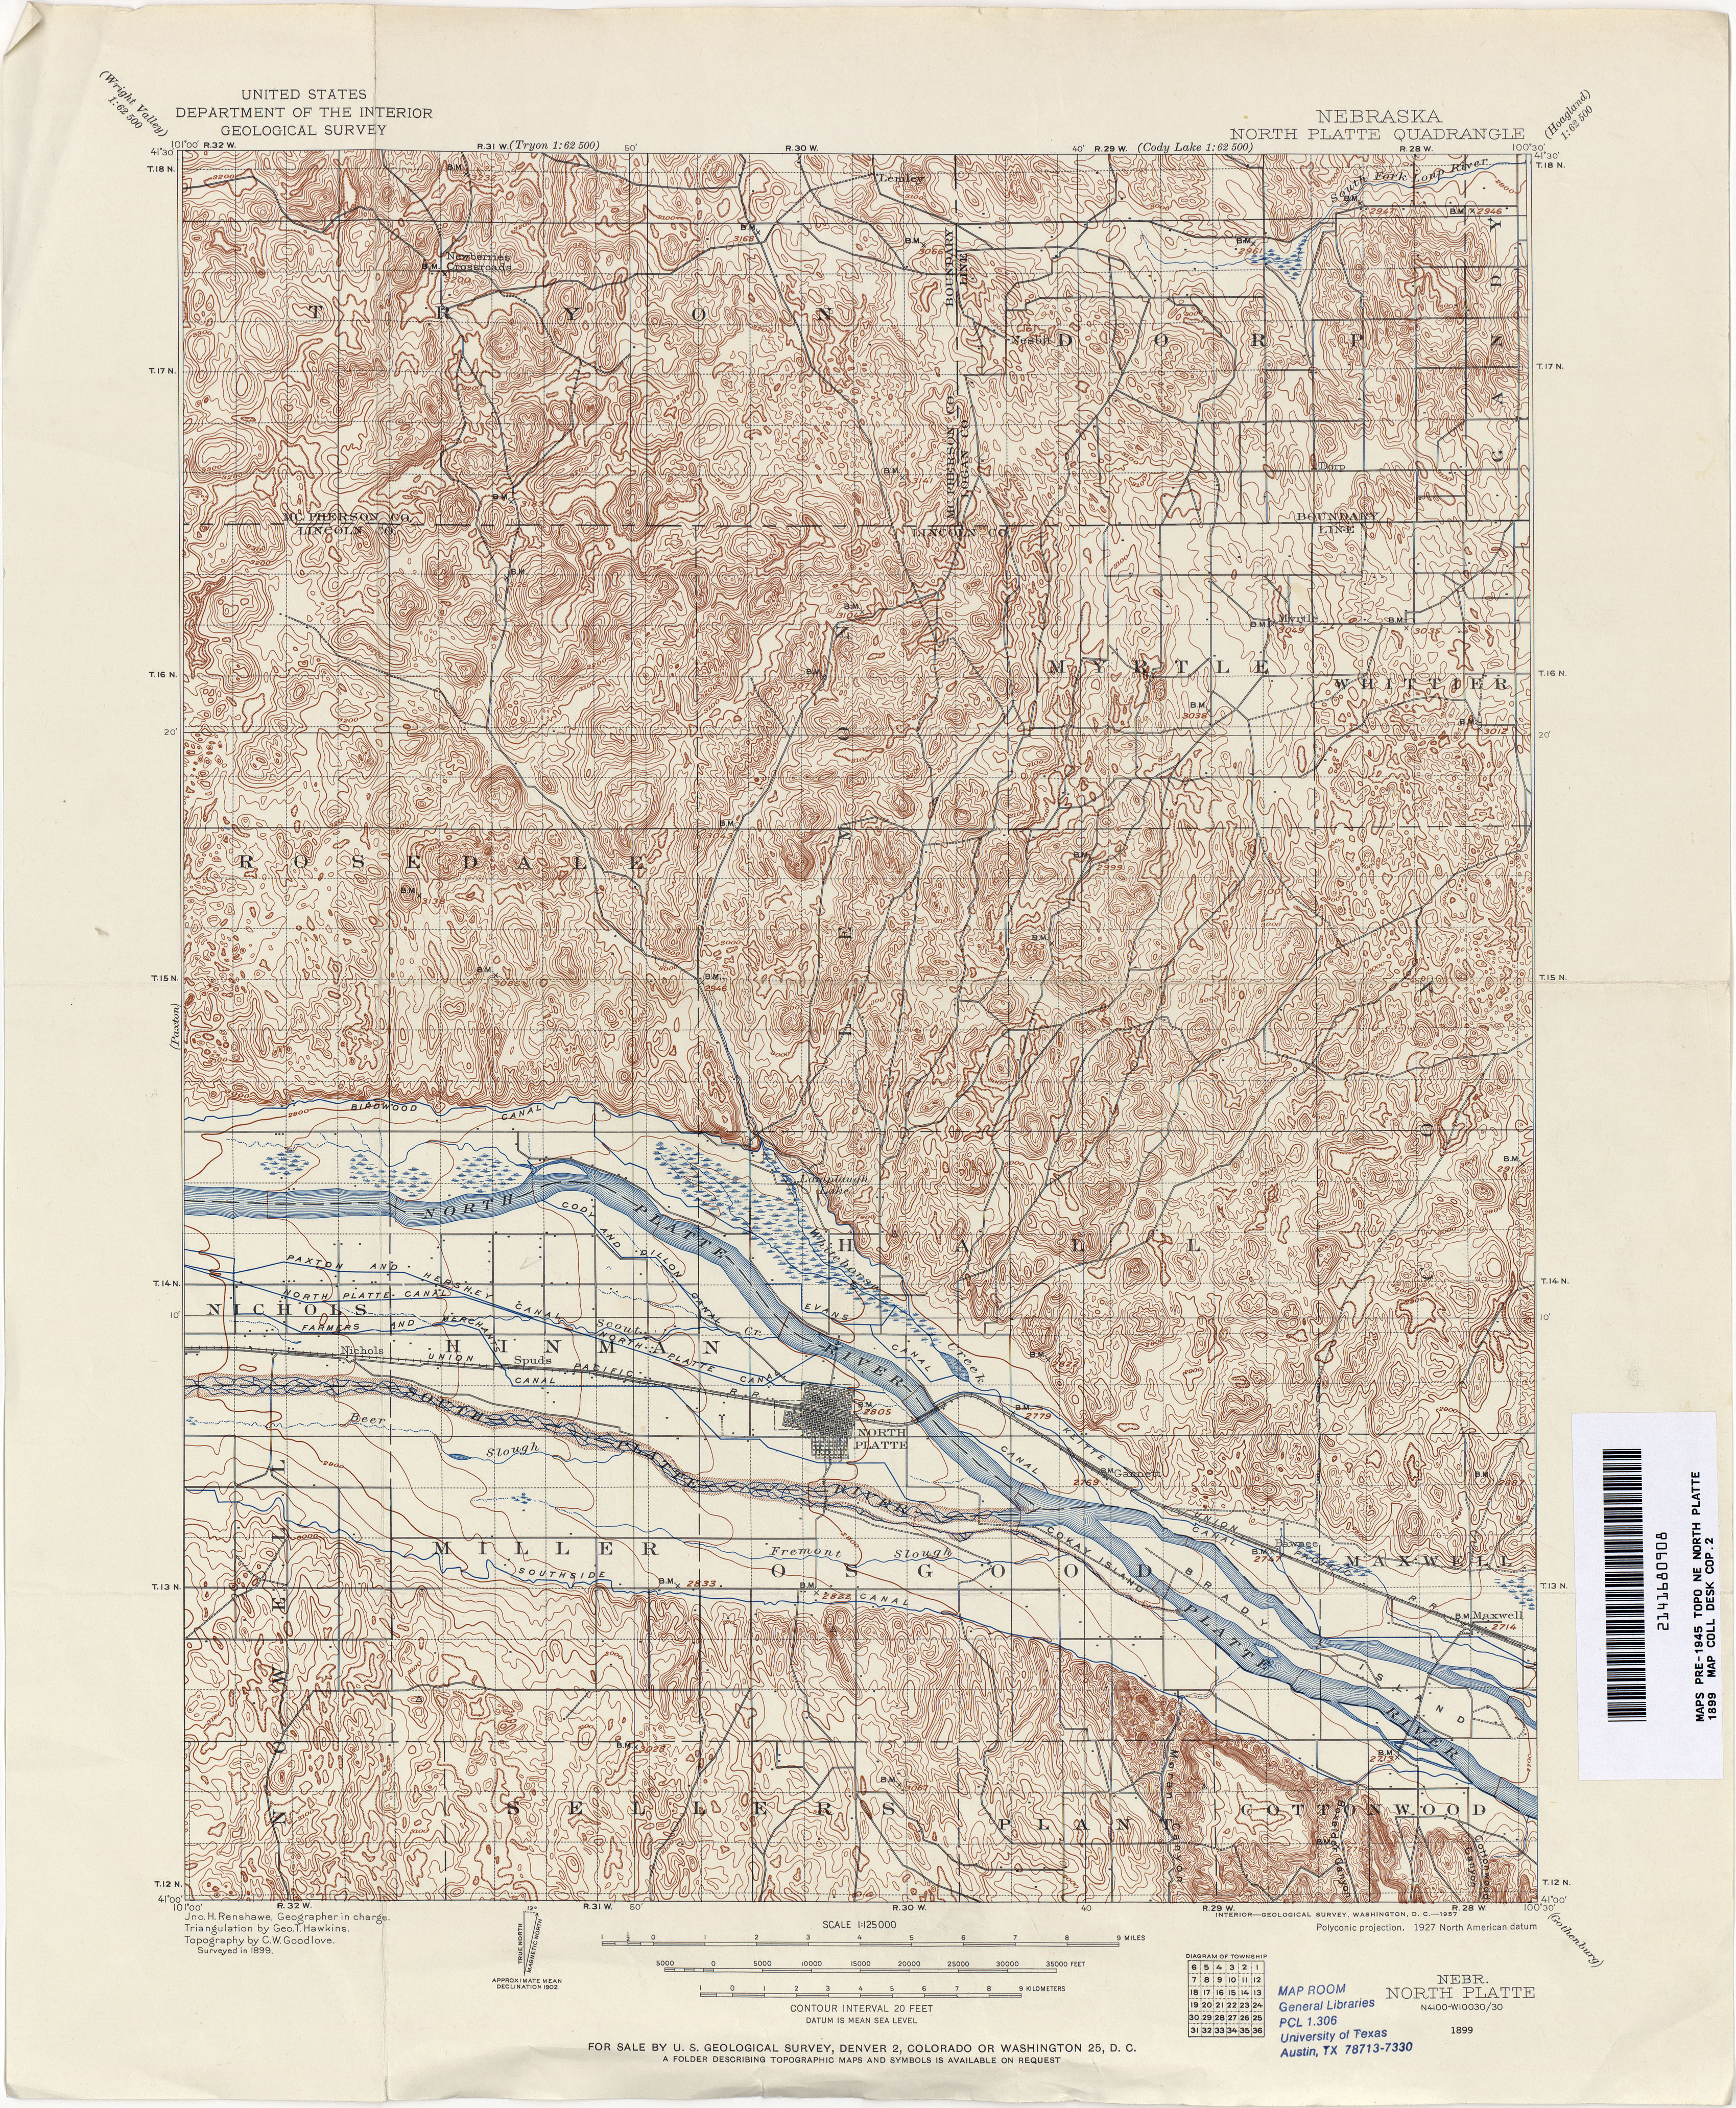 Nebraska Historical Topographic Maps PerryCastañeda Map - Show nebraska on us map